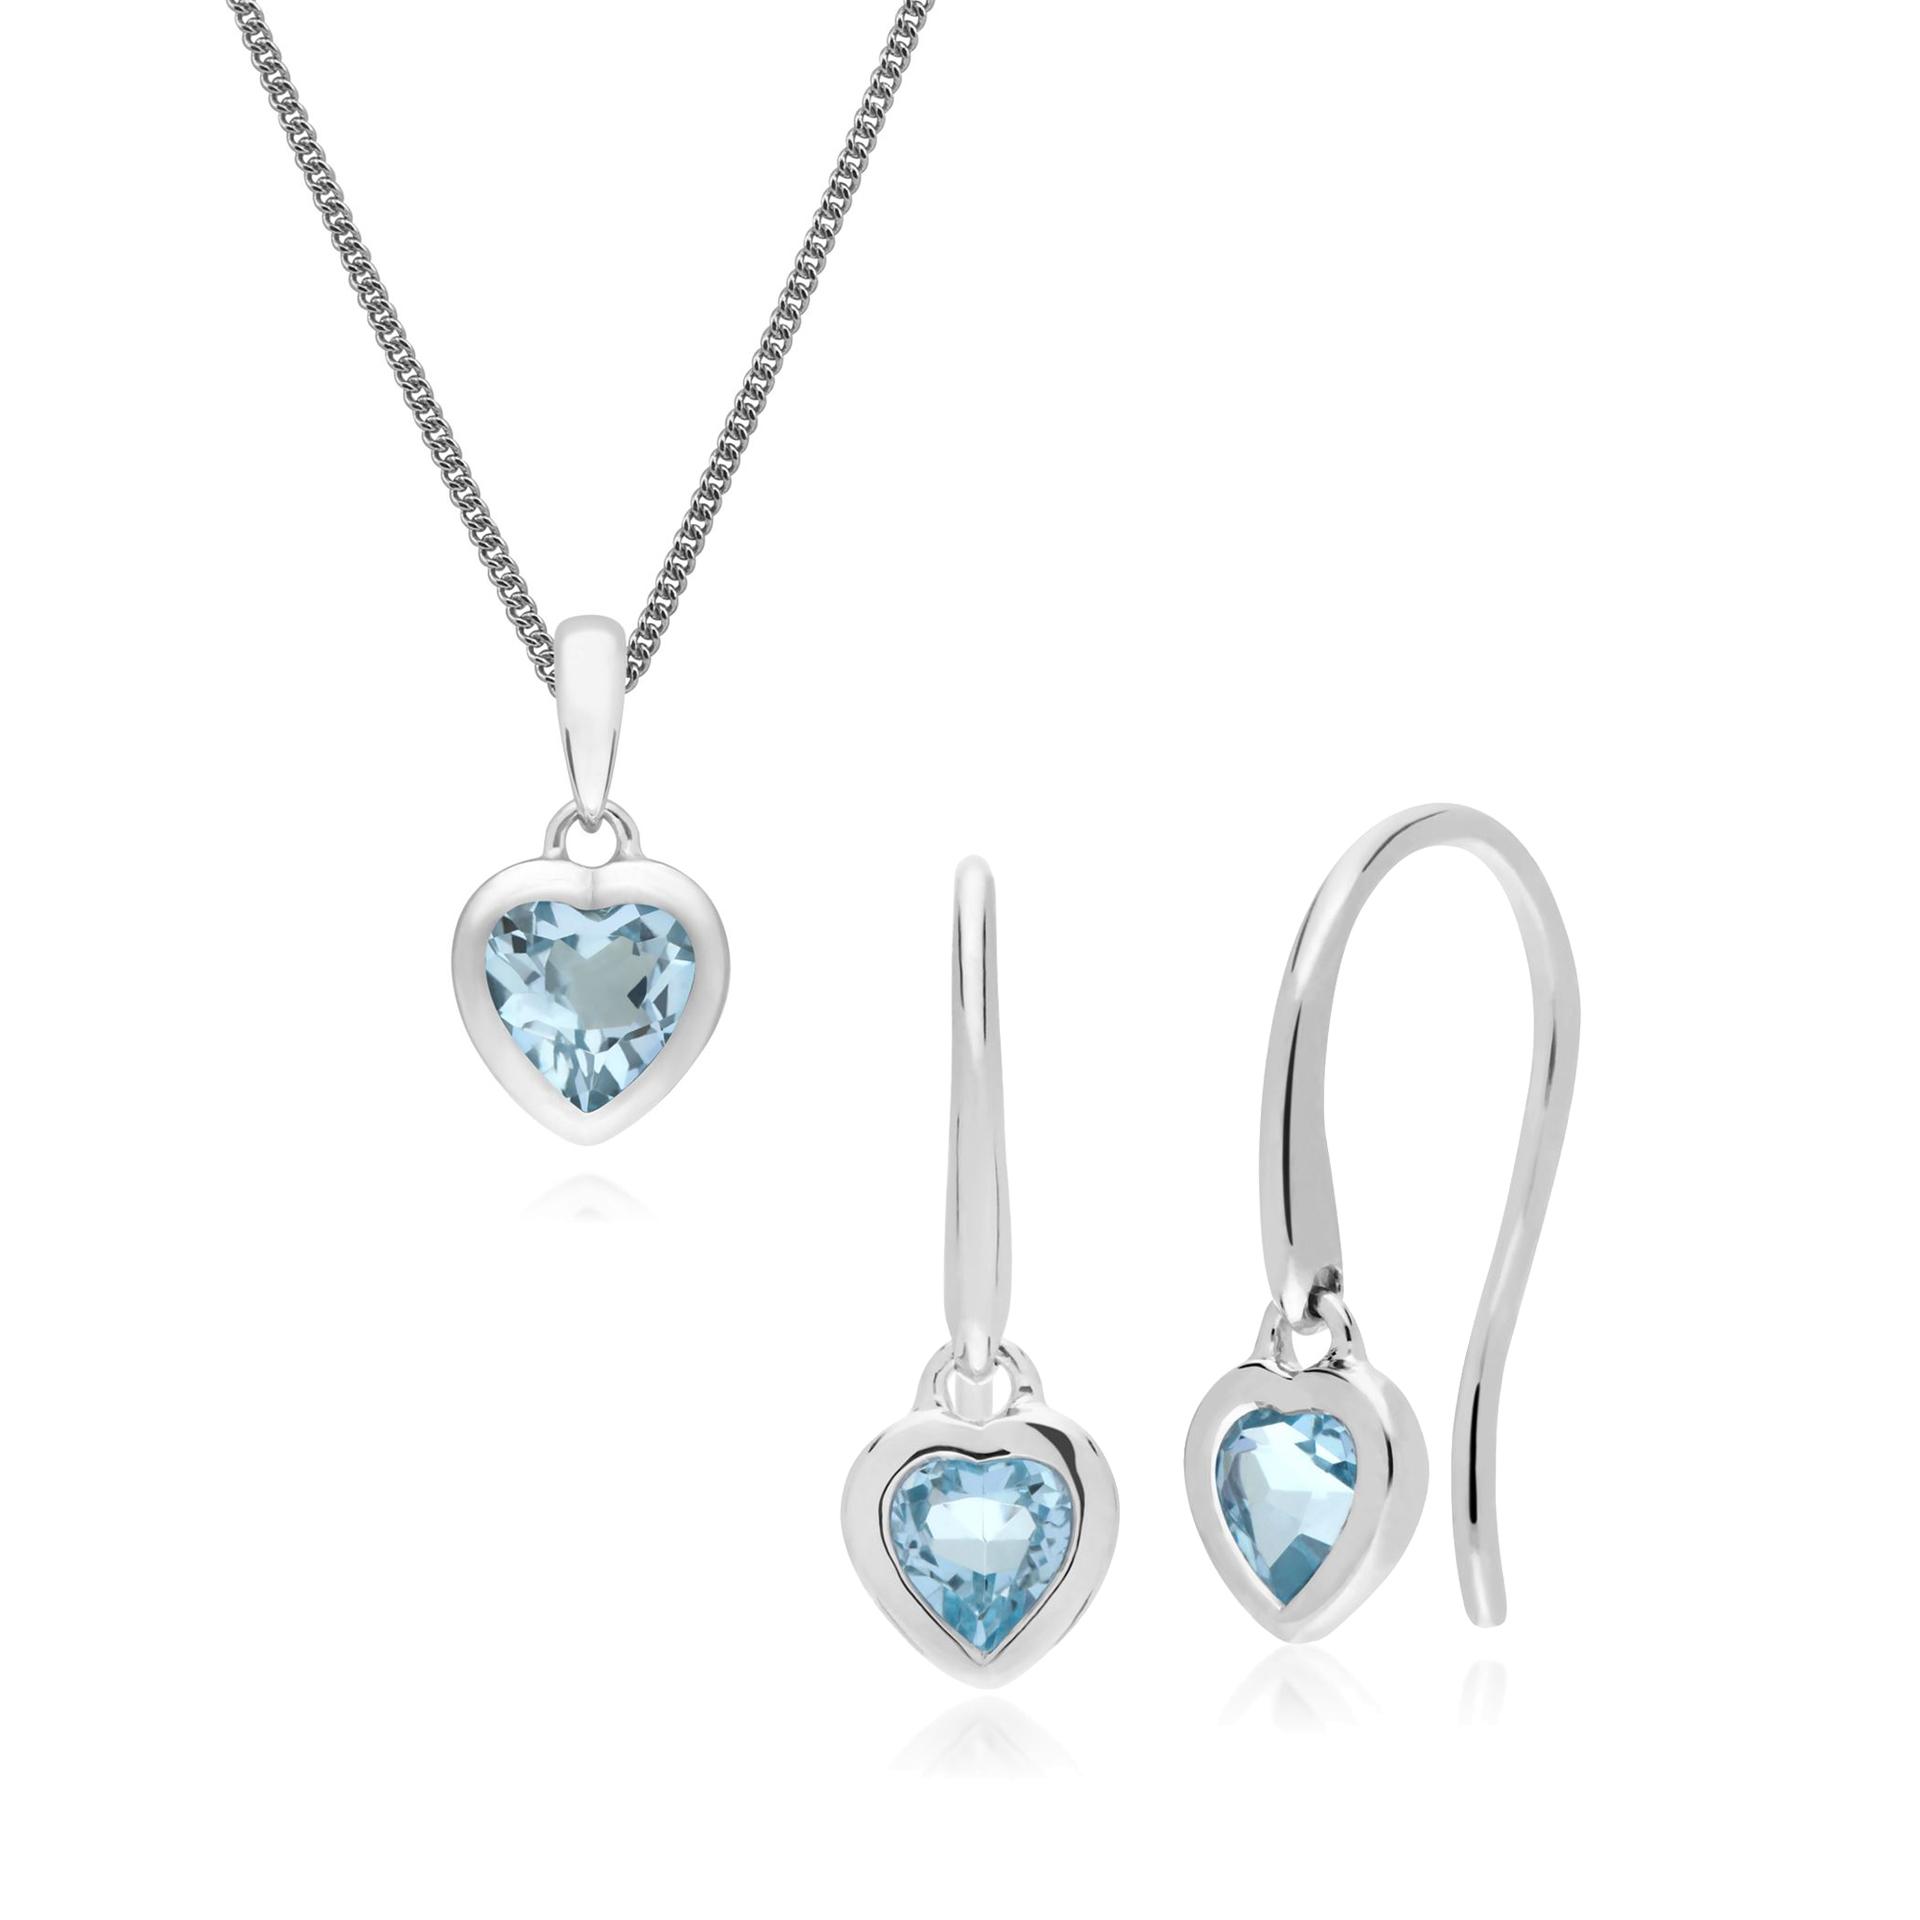 Sterling silver drop earrings set with blue topaz stones.